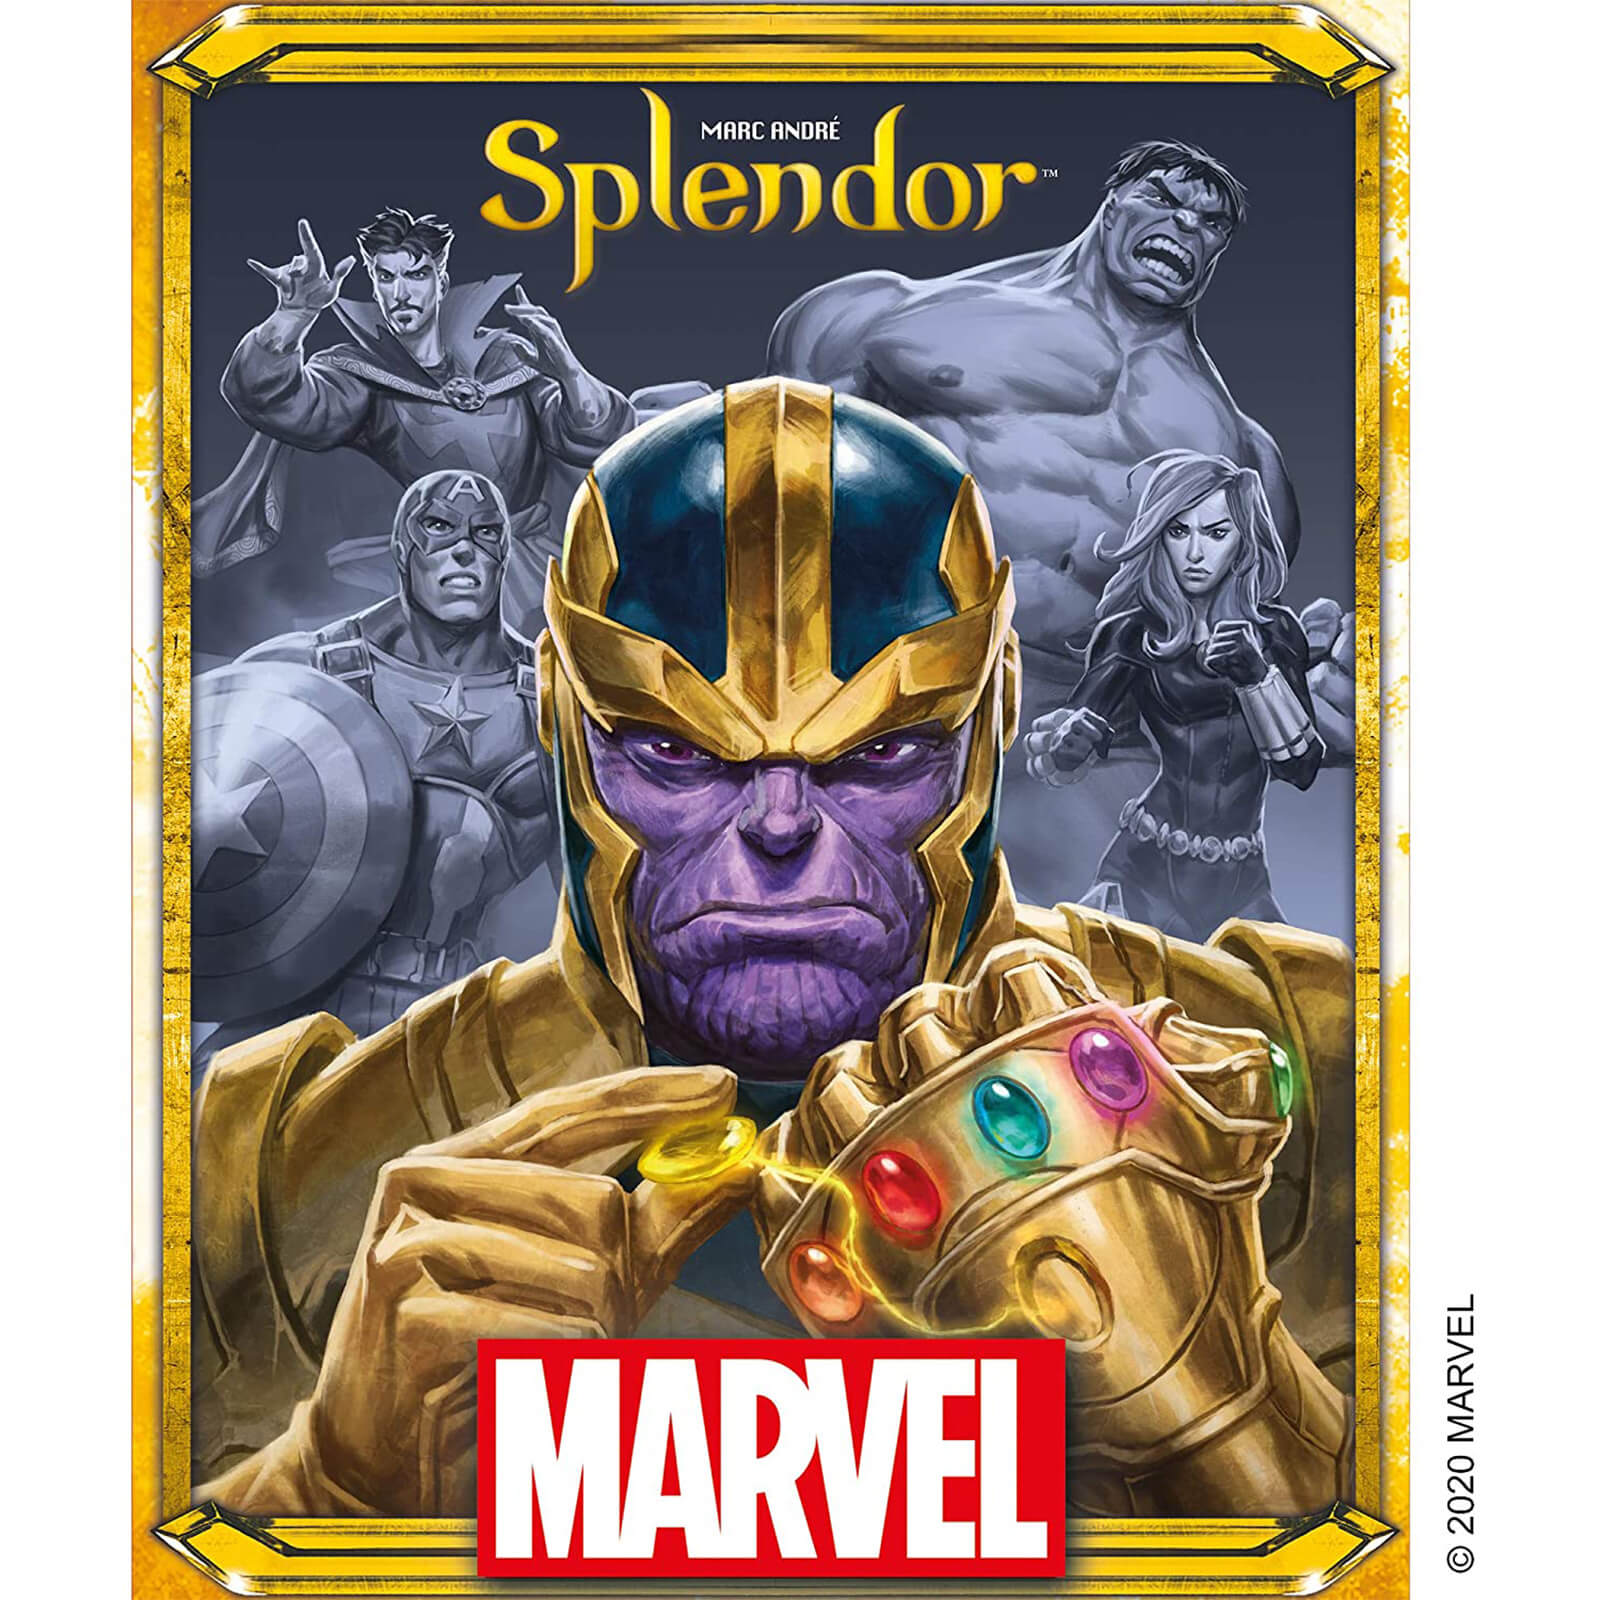 Image of Splendor Board Game - Marvel Edition